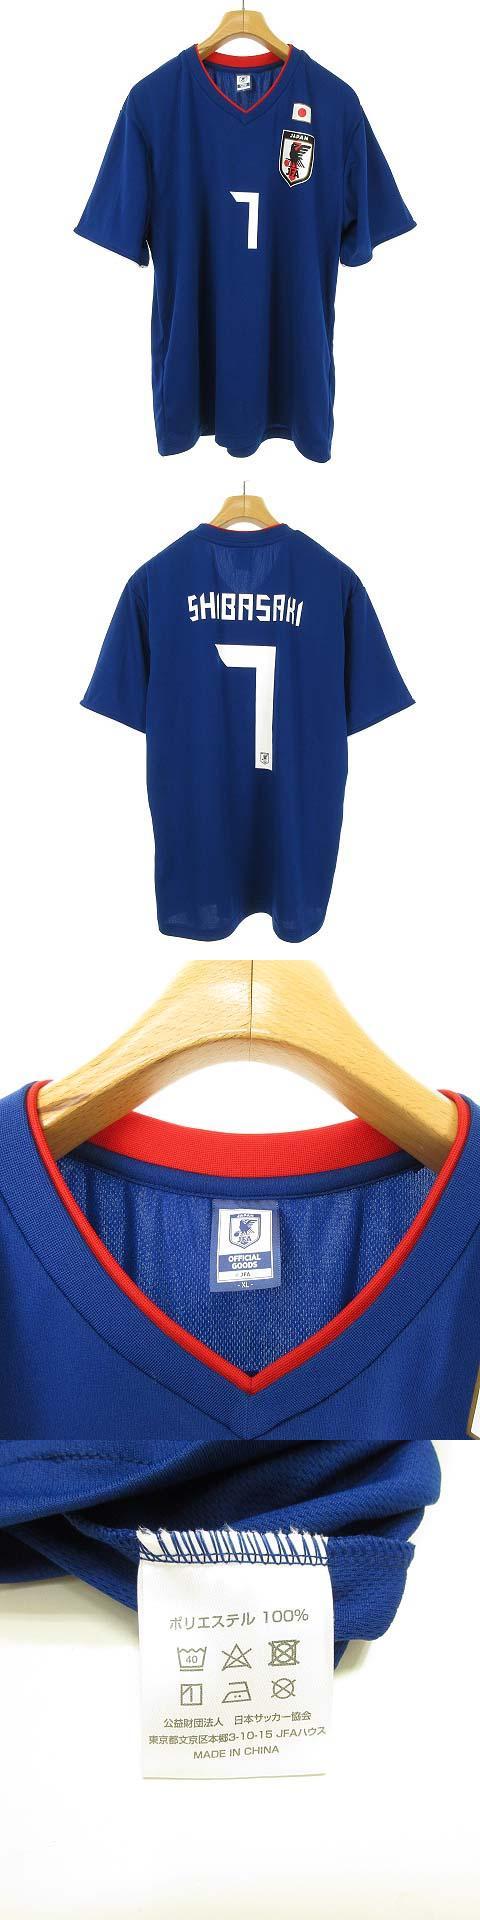 JFA サッカー 日本代表 オフィシャルグッズ ユニフォーム 7 柴崎 XL ブルー